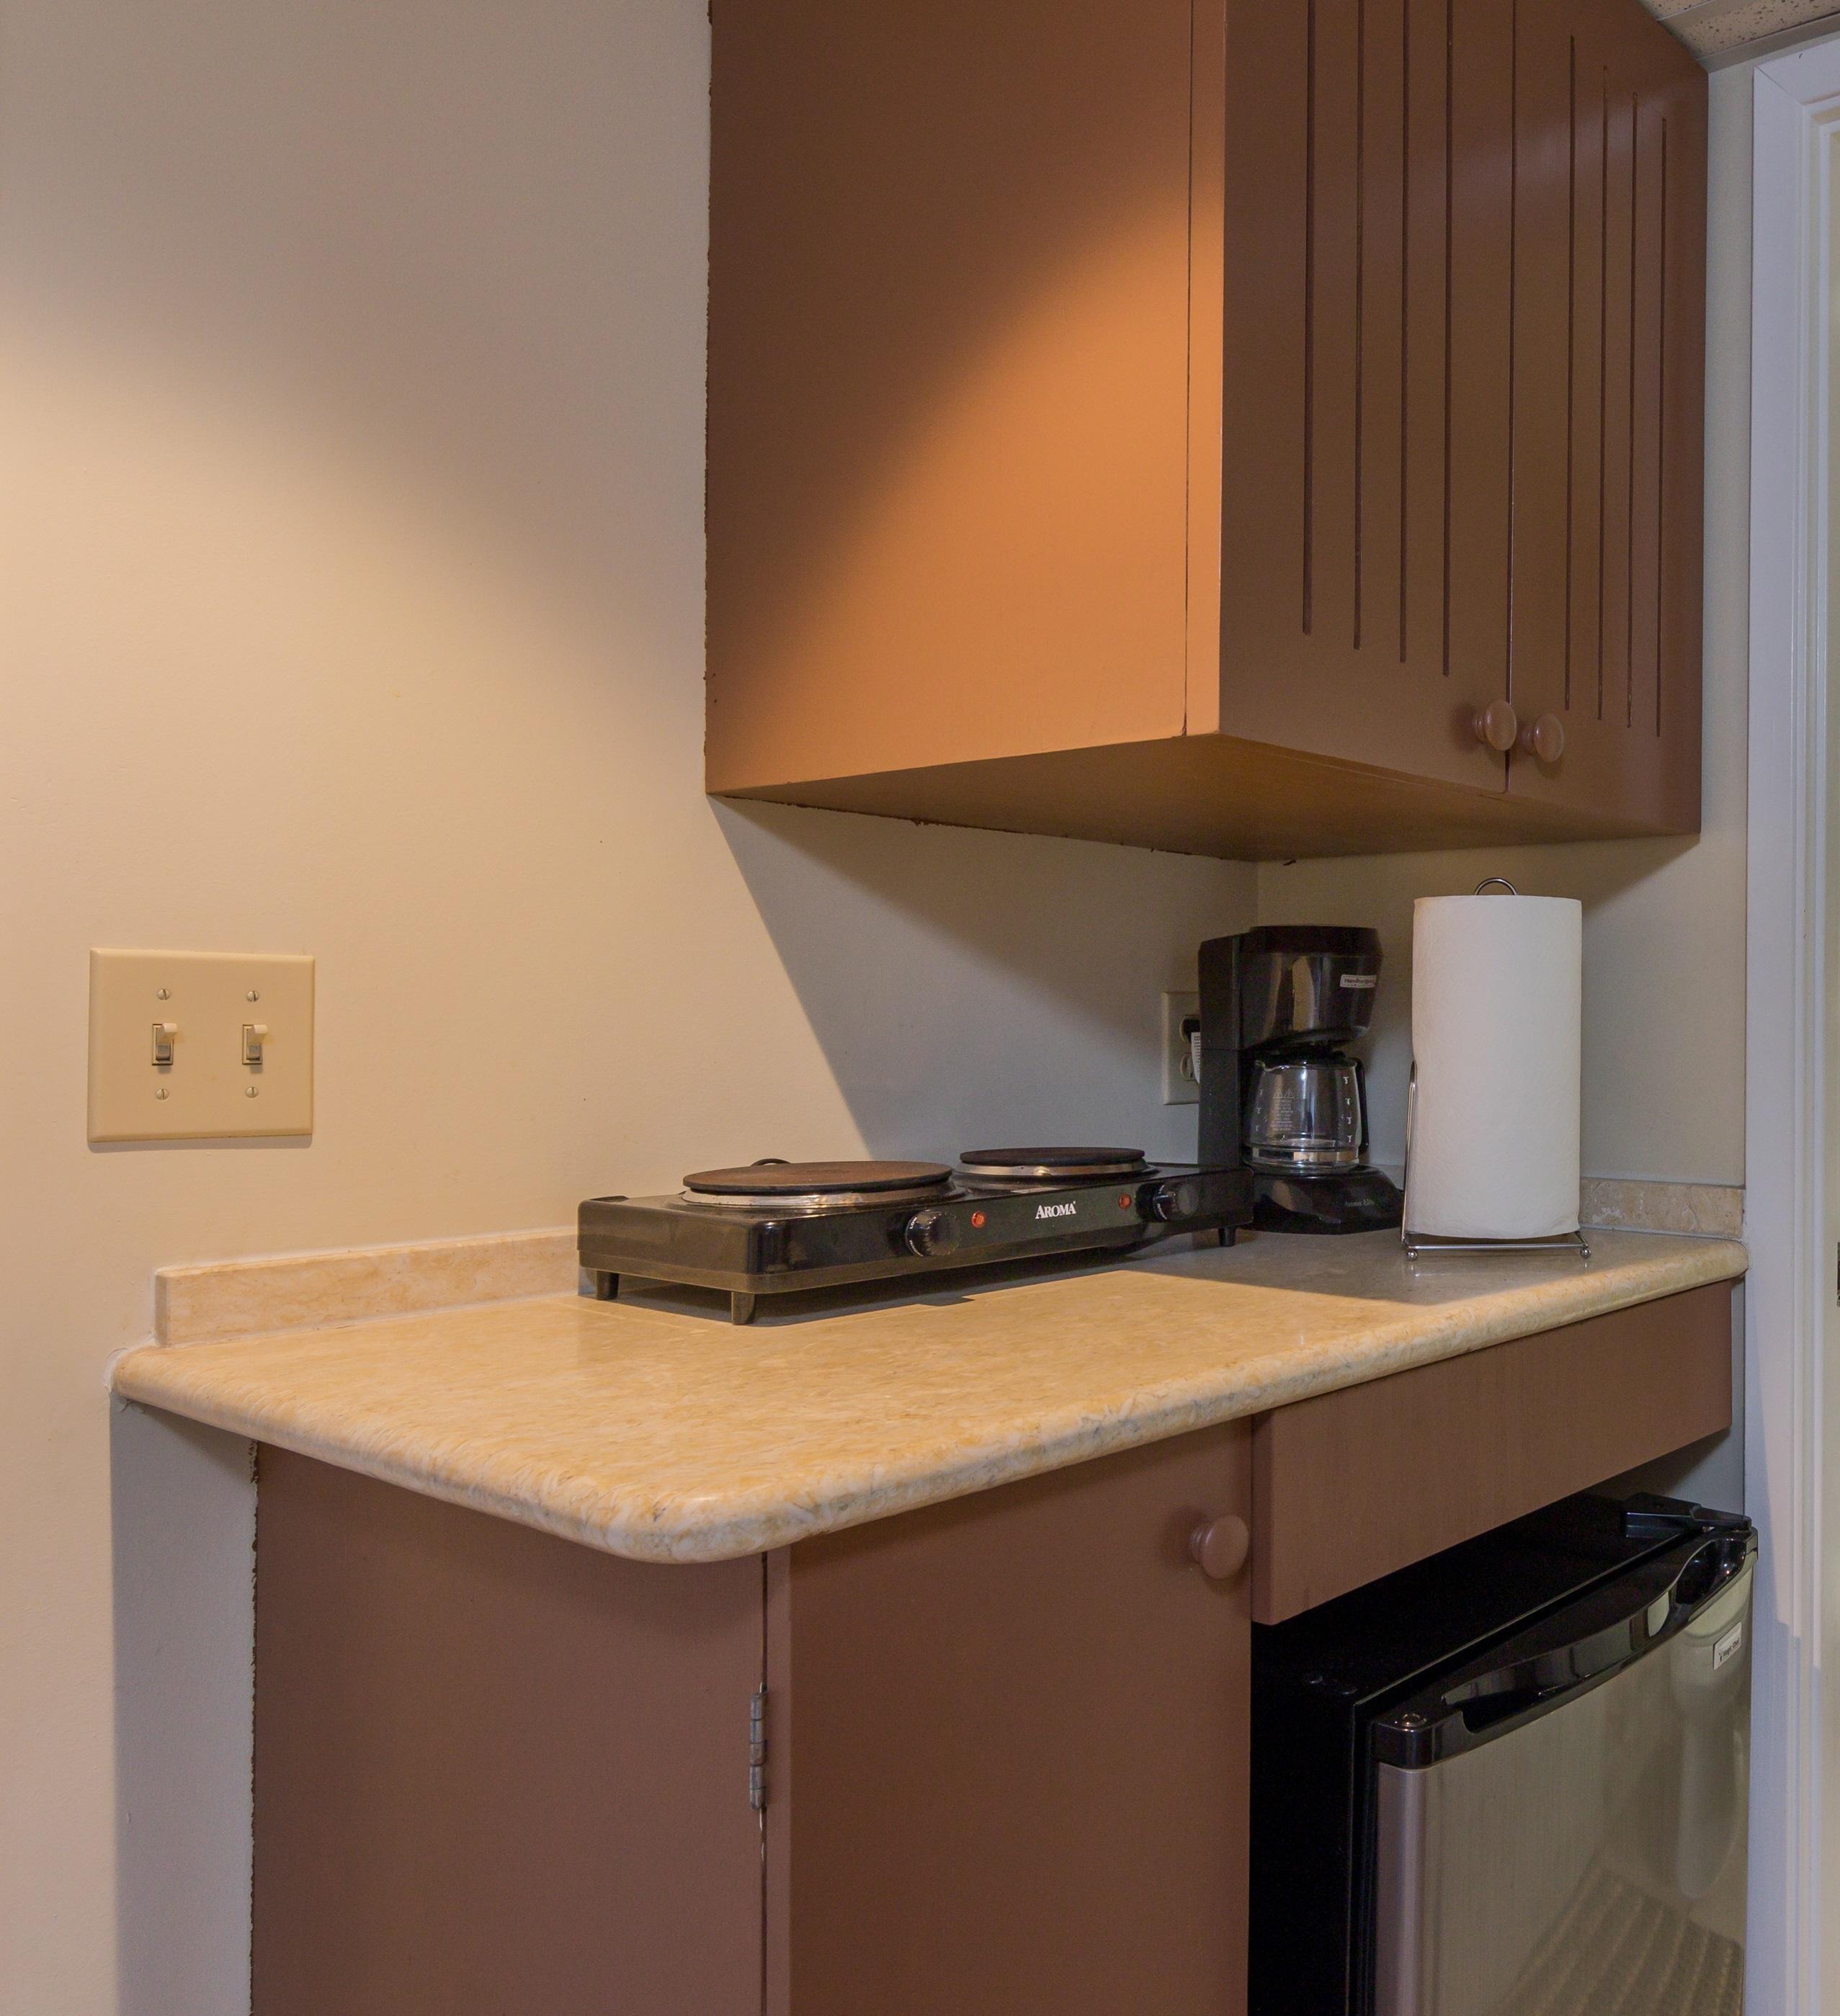 In-Room Conveniences mini fridge, coffee maker and electric burners